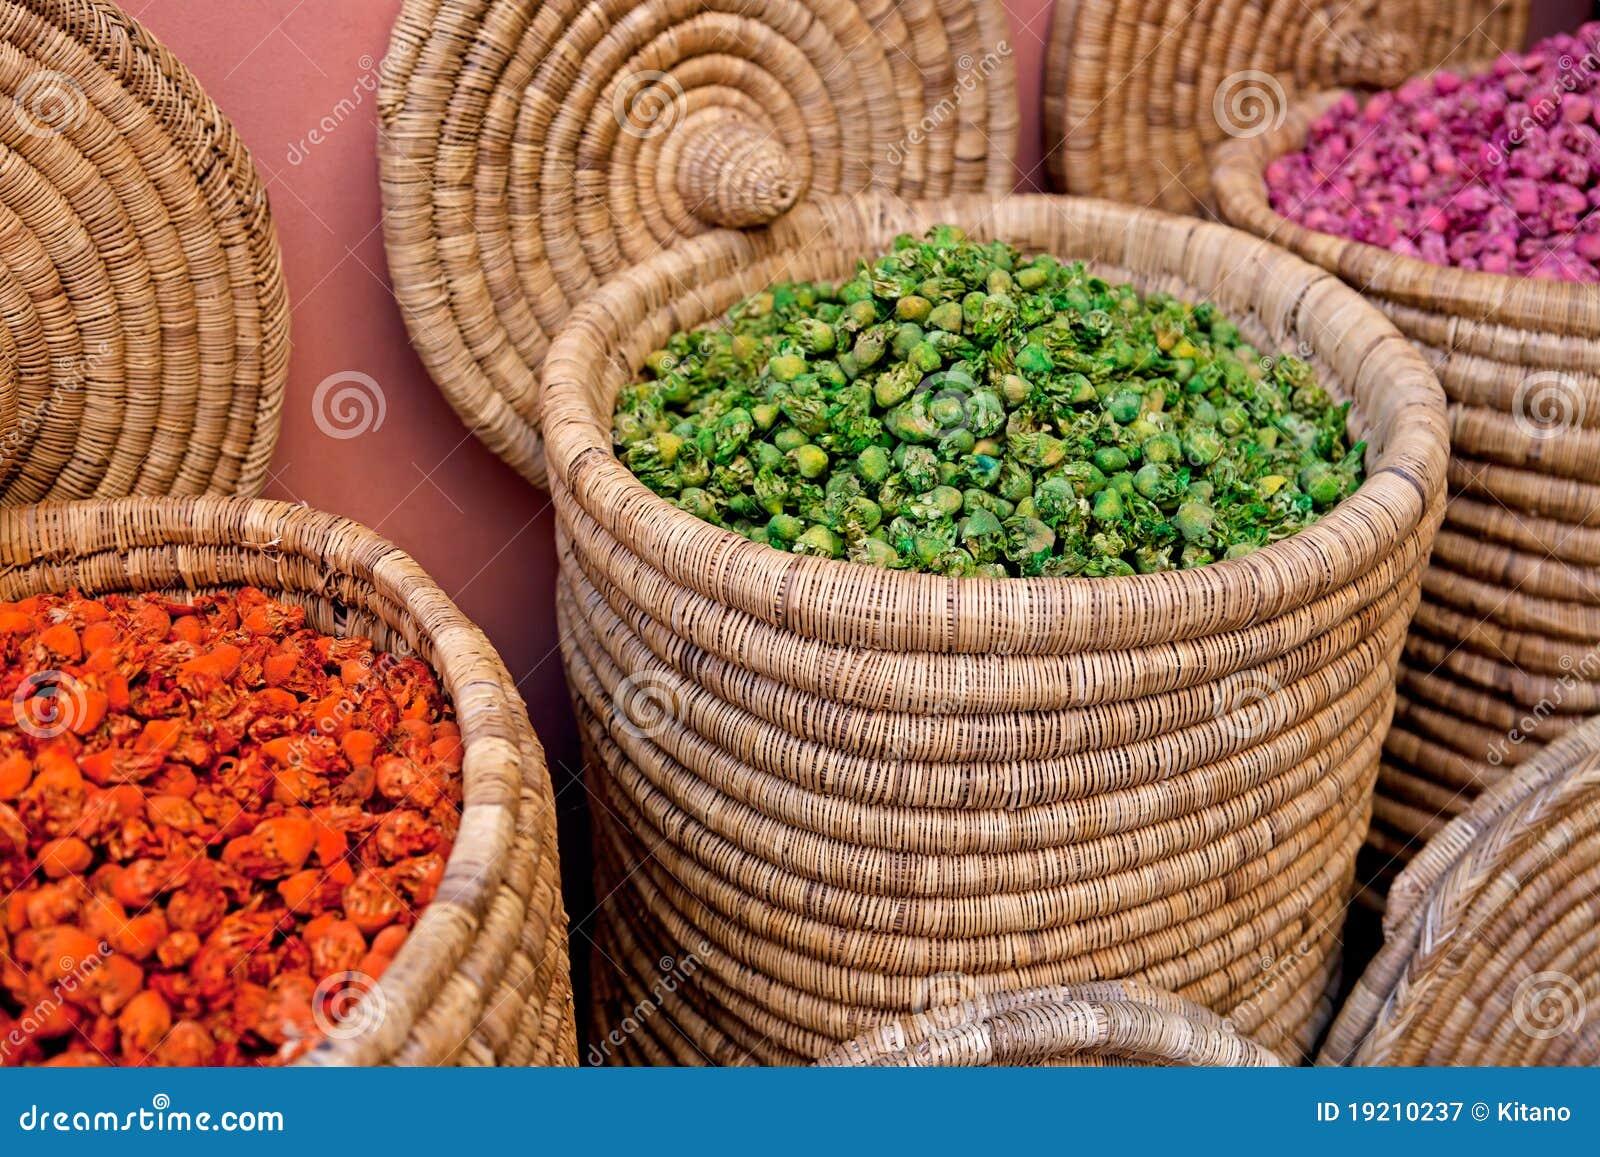 moroccan spice market stock photos - image: 14613313